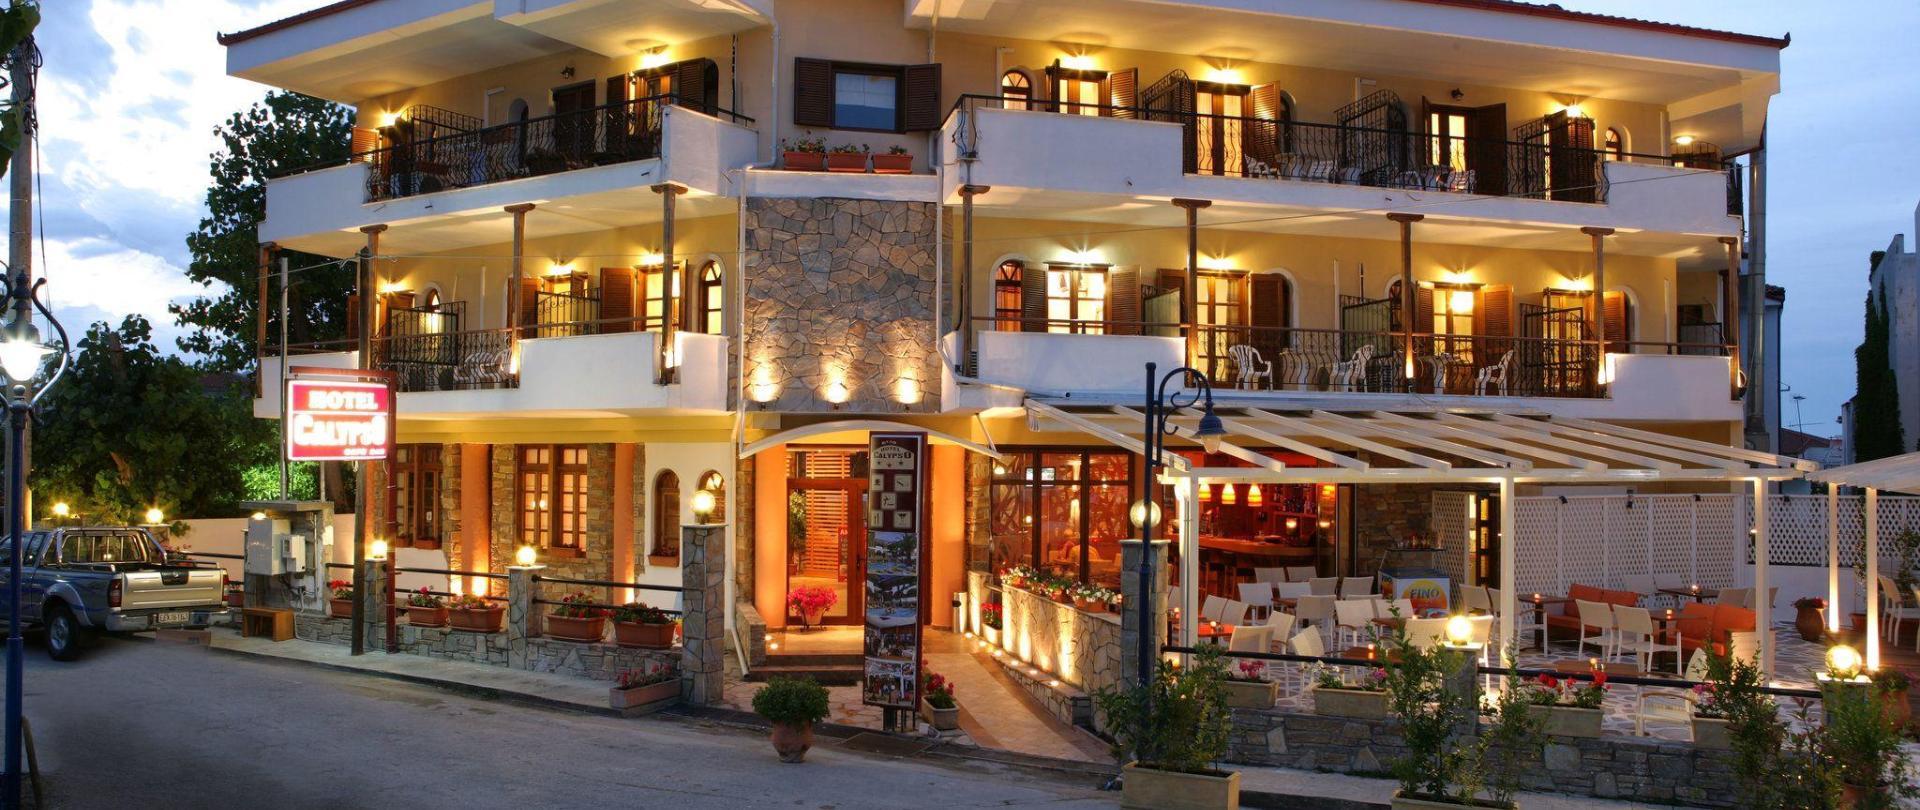 hotel-calypso.jpg